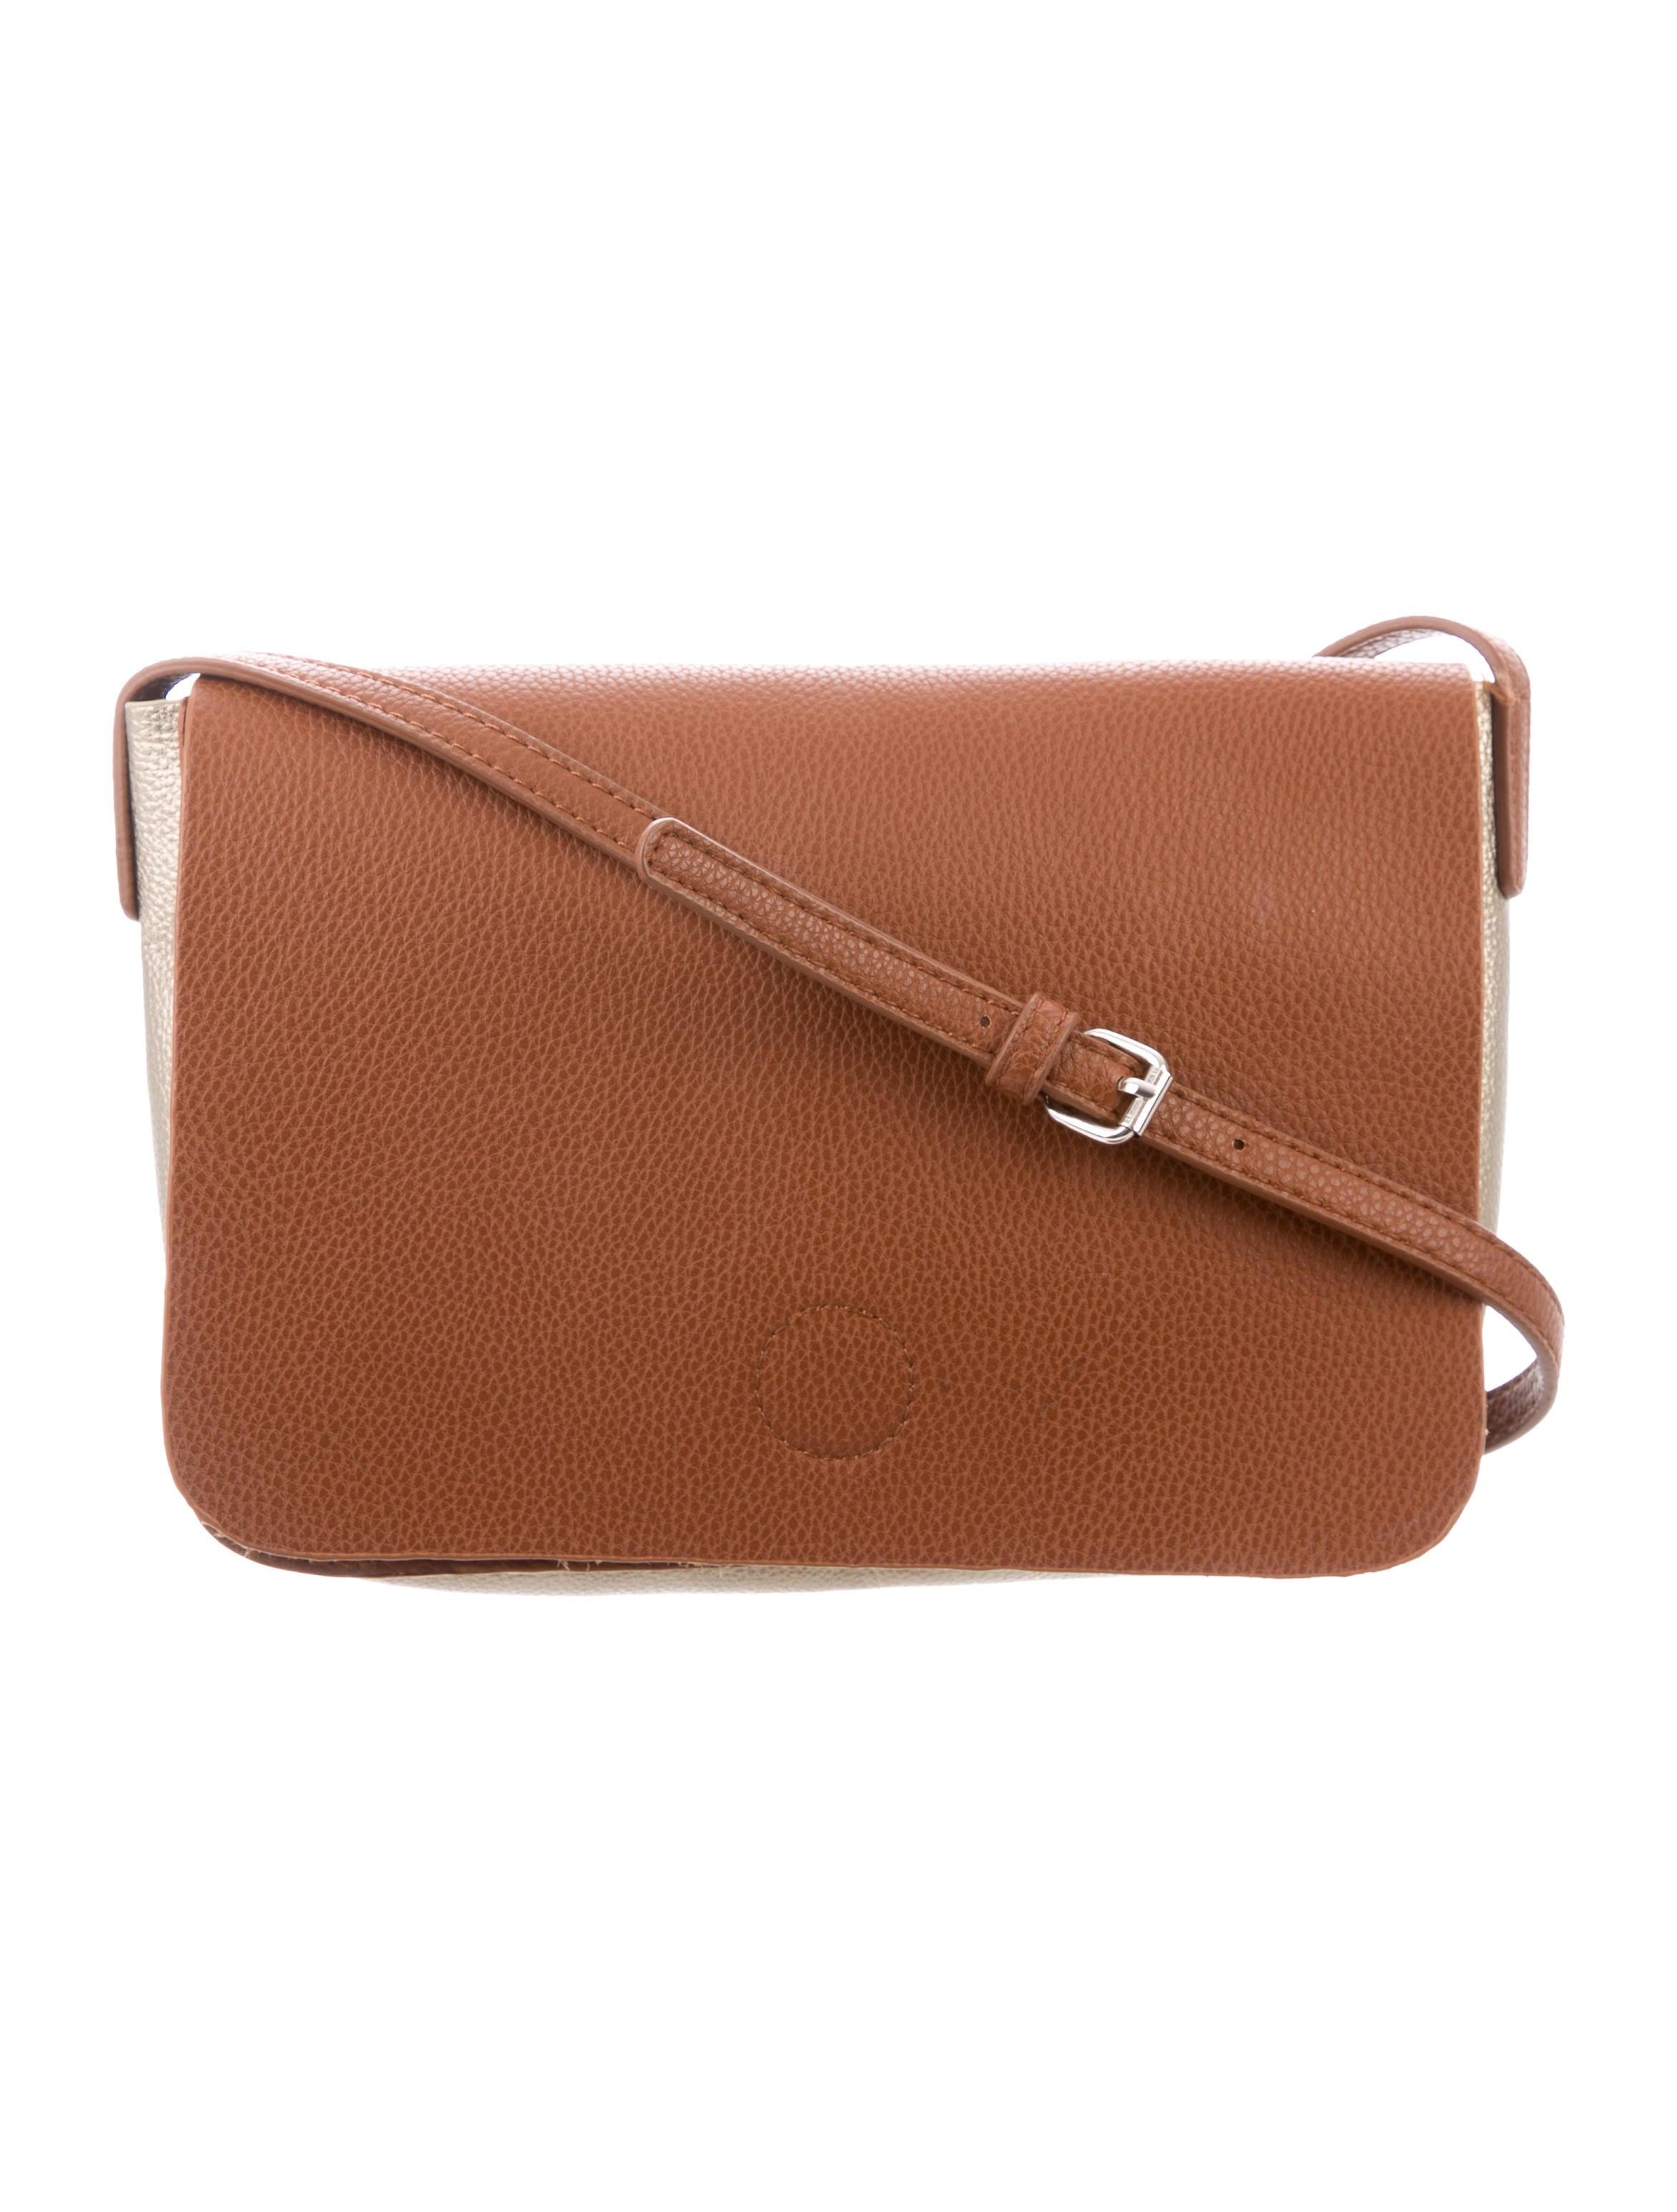 478a3813d874 Barney's New York Leather Shoulder Bag - Handbags - WBANY23248 | The ...